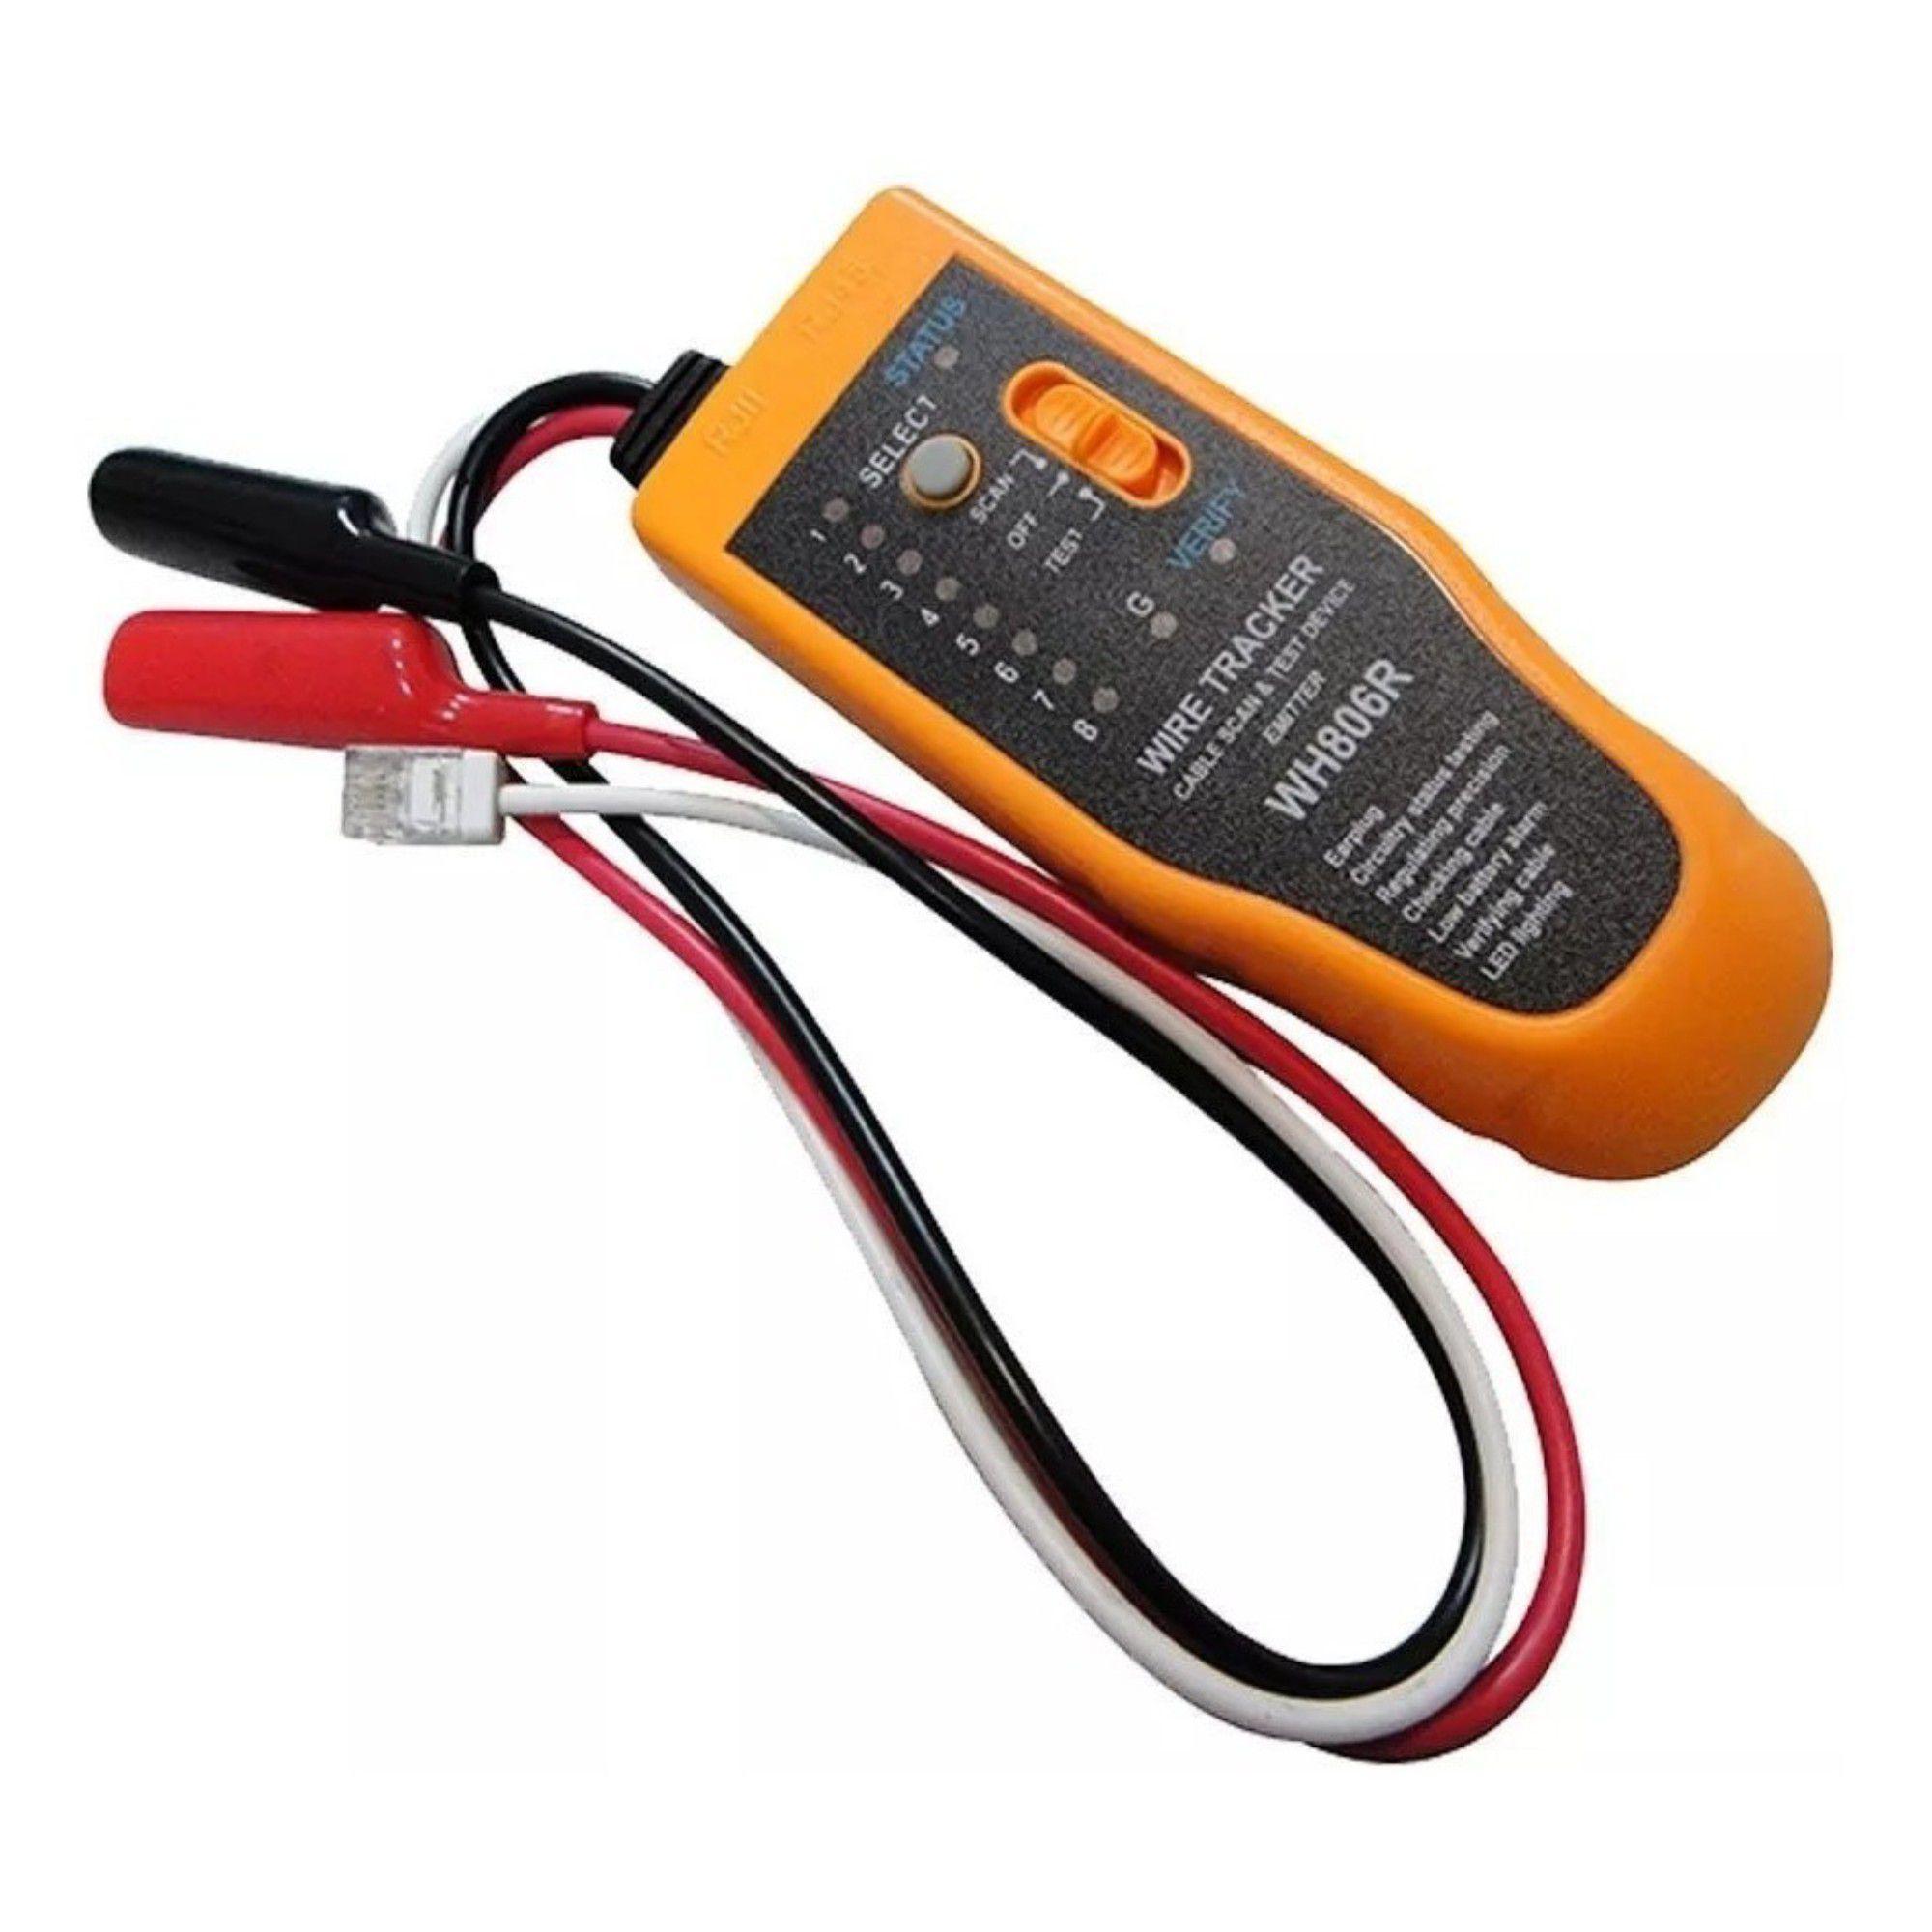 Kit Localizador de Cabos C/ Zumbidor + Testador Lisko